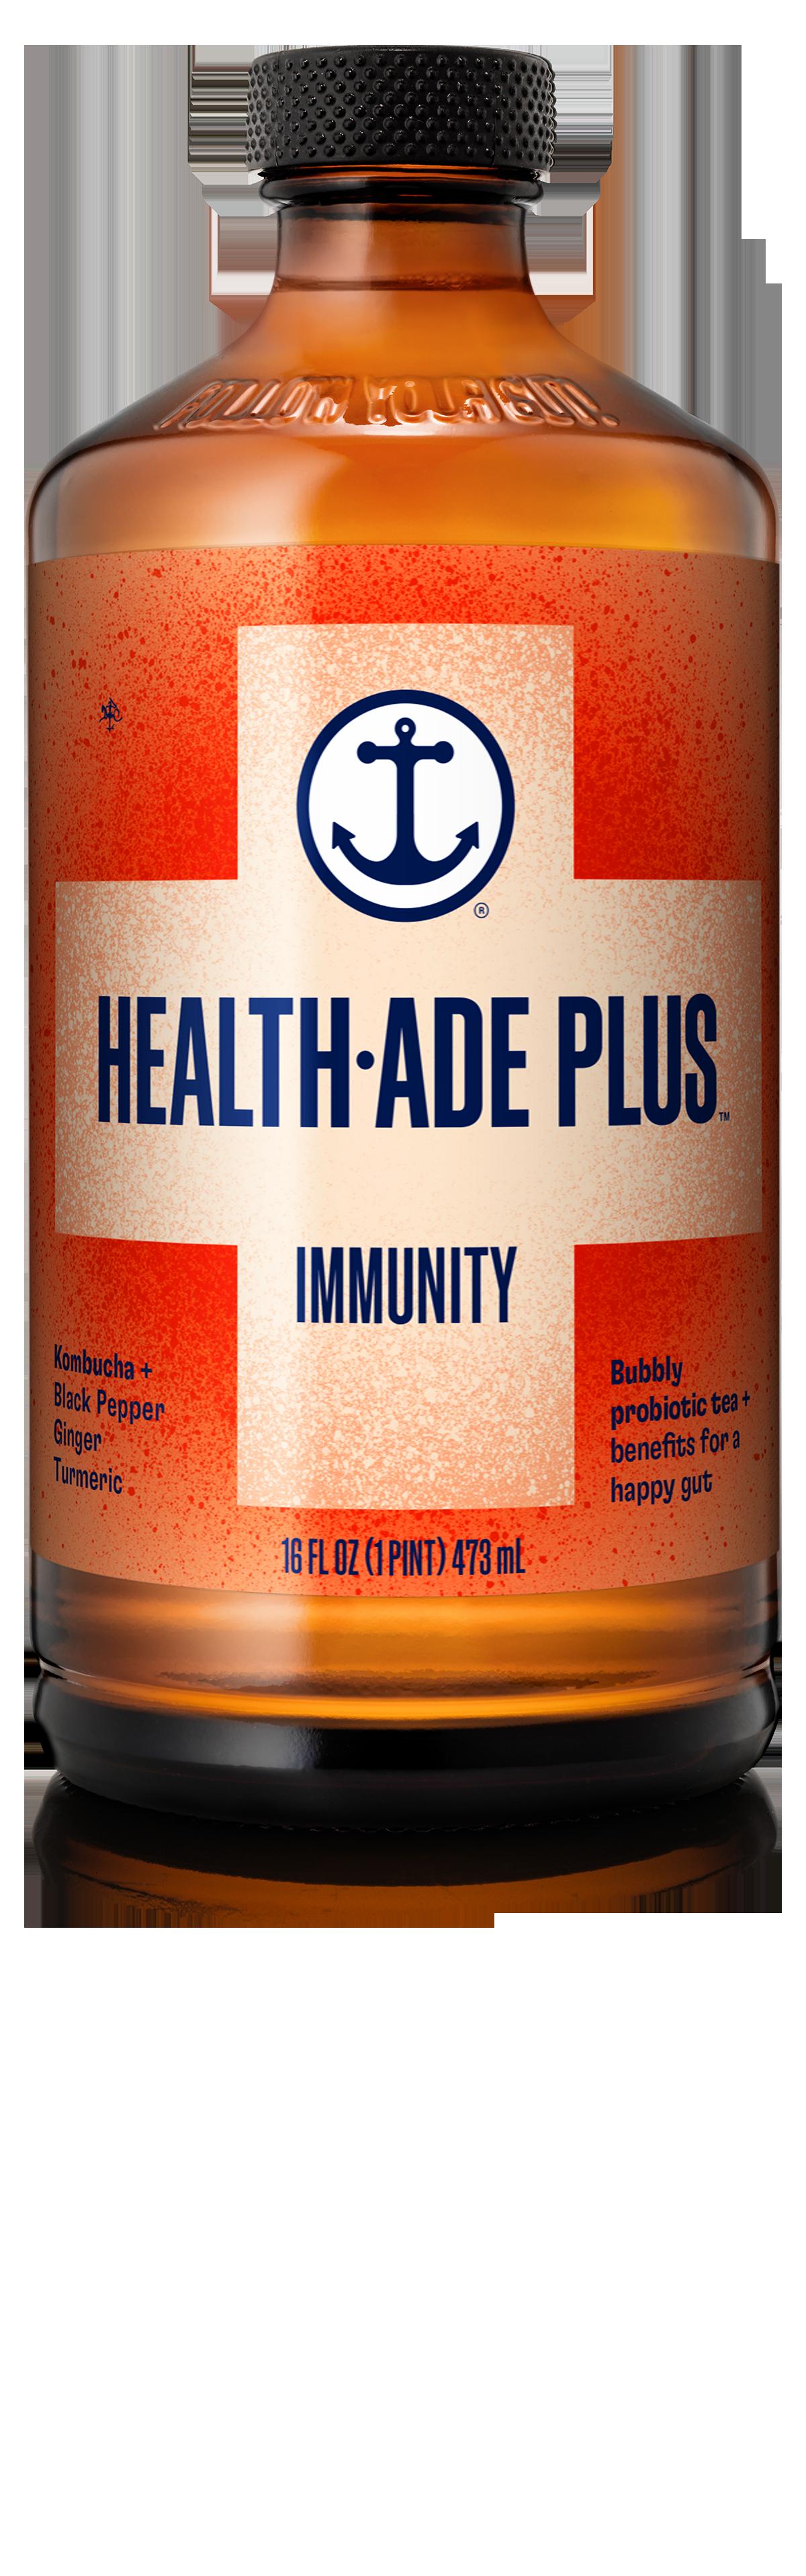 Health-Ade PLUS Immunity